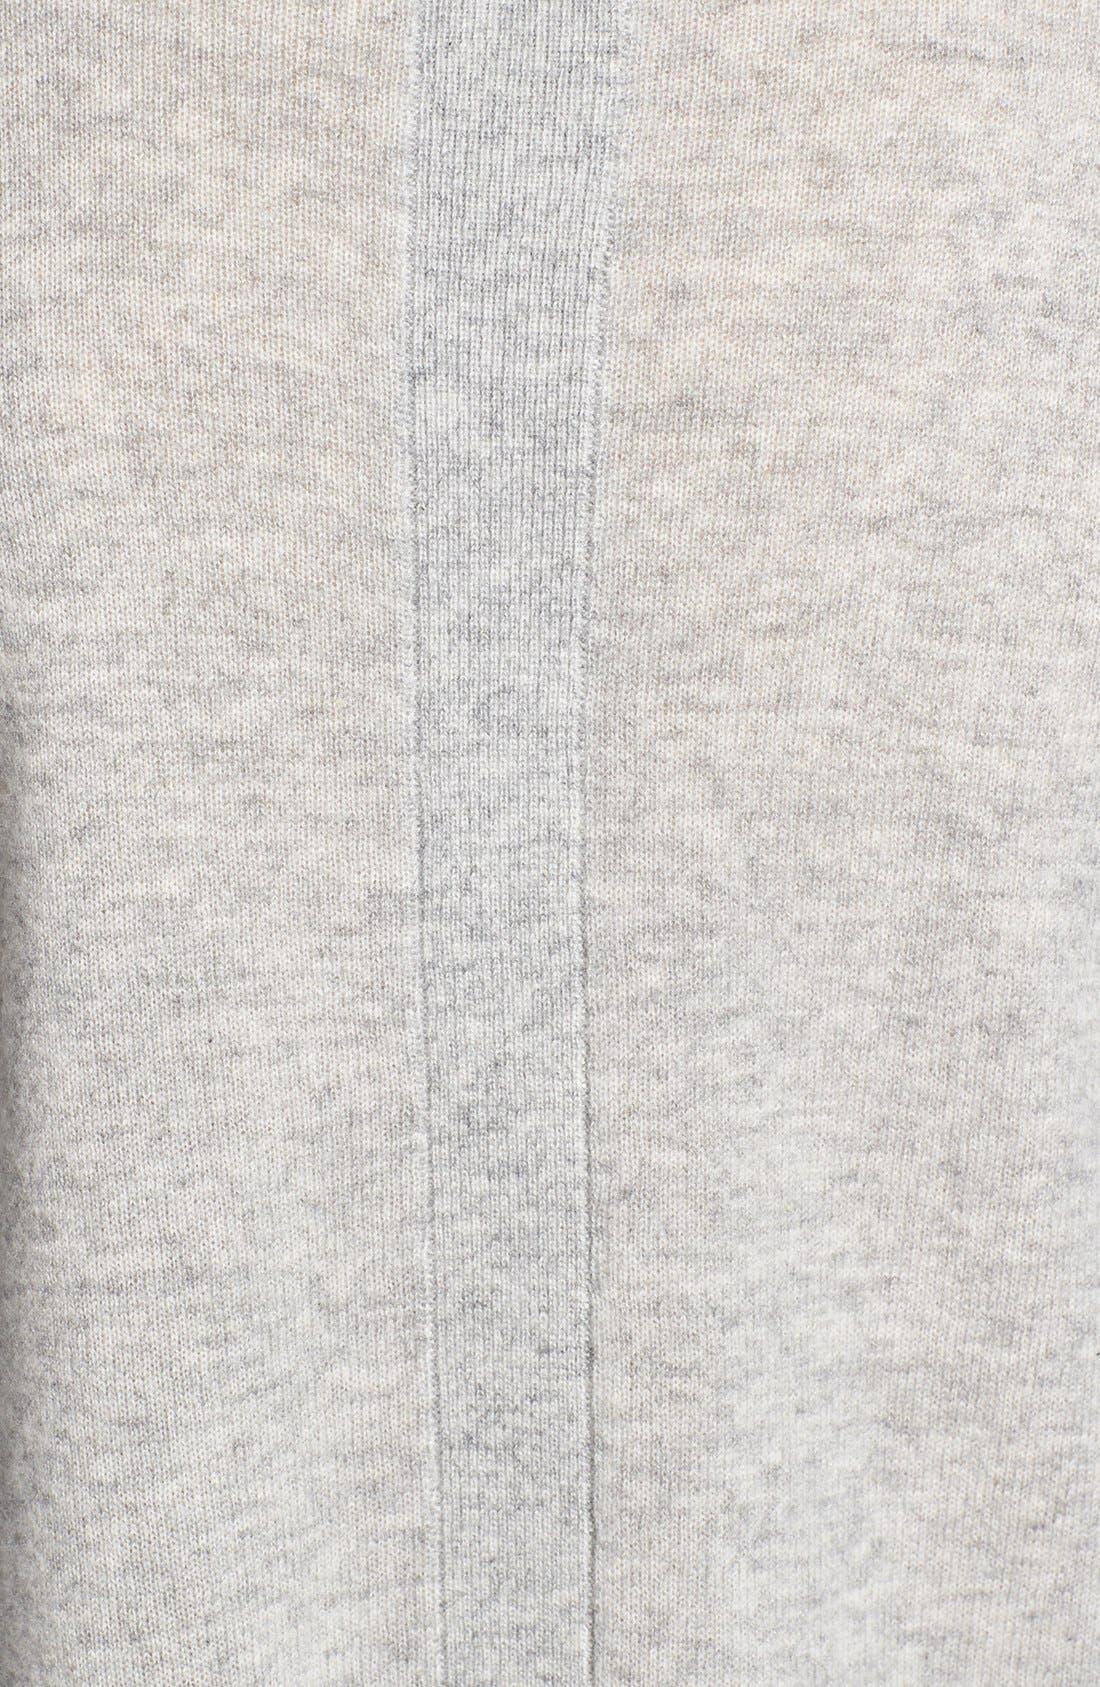 Alternate Image 3  - Halogen® Lightweight Cashmere Crewneck Sweater with Pocket (Petite)